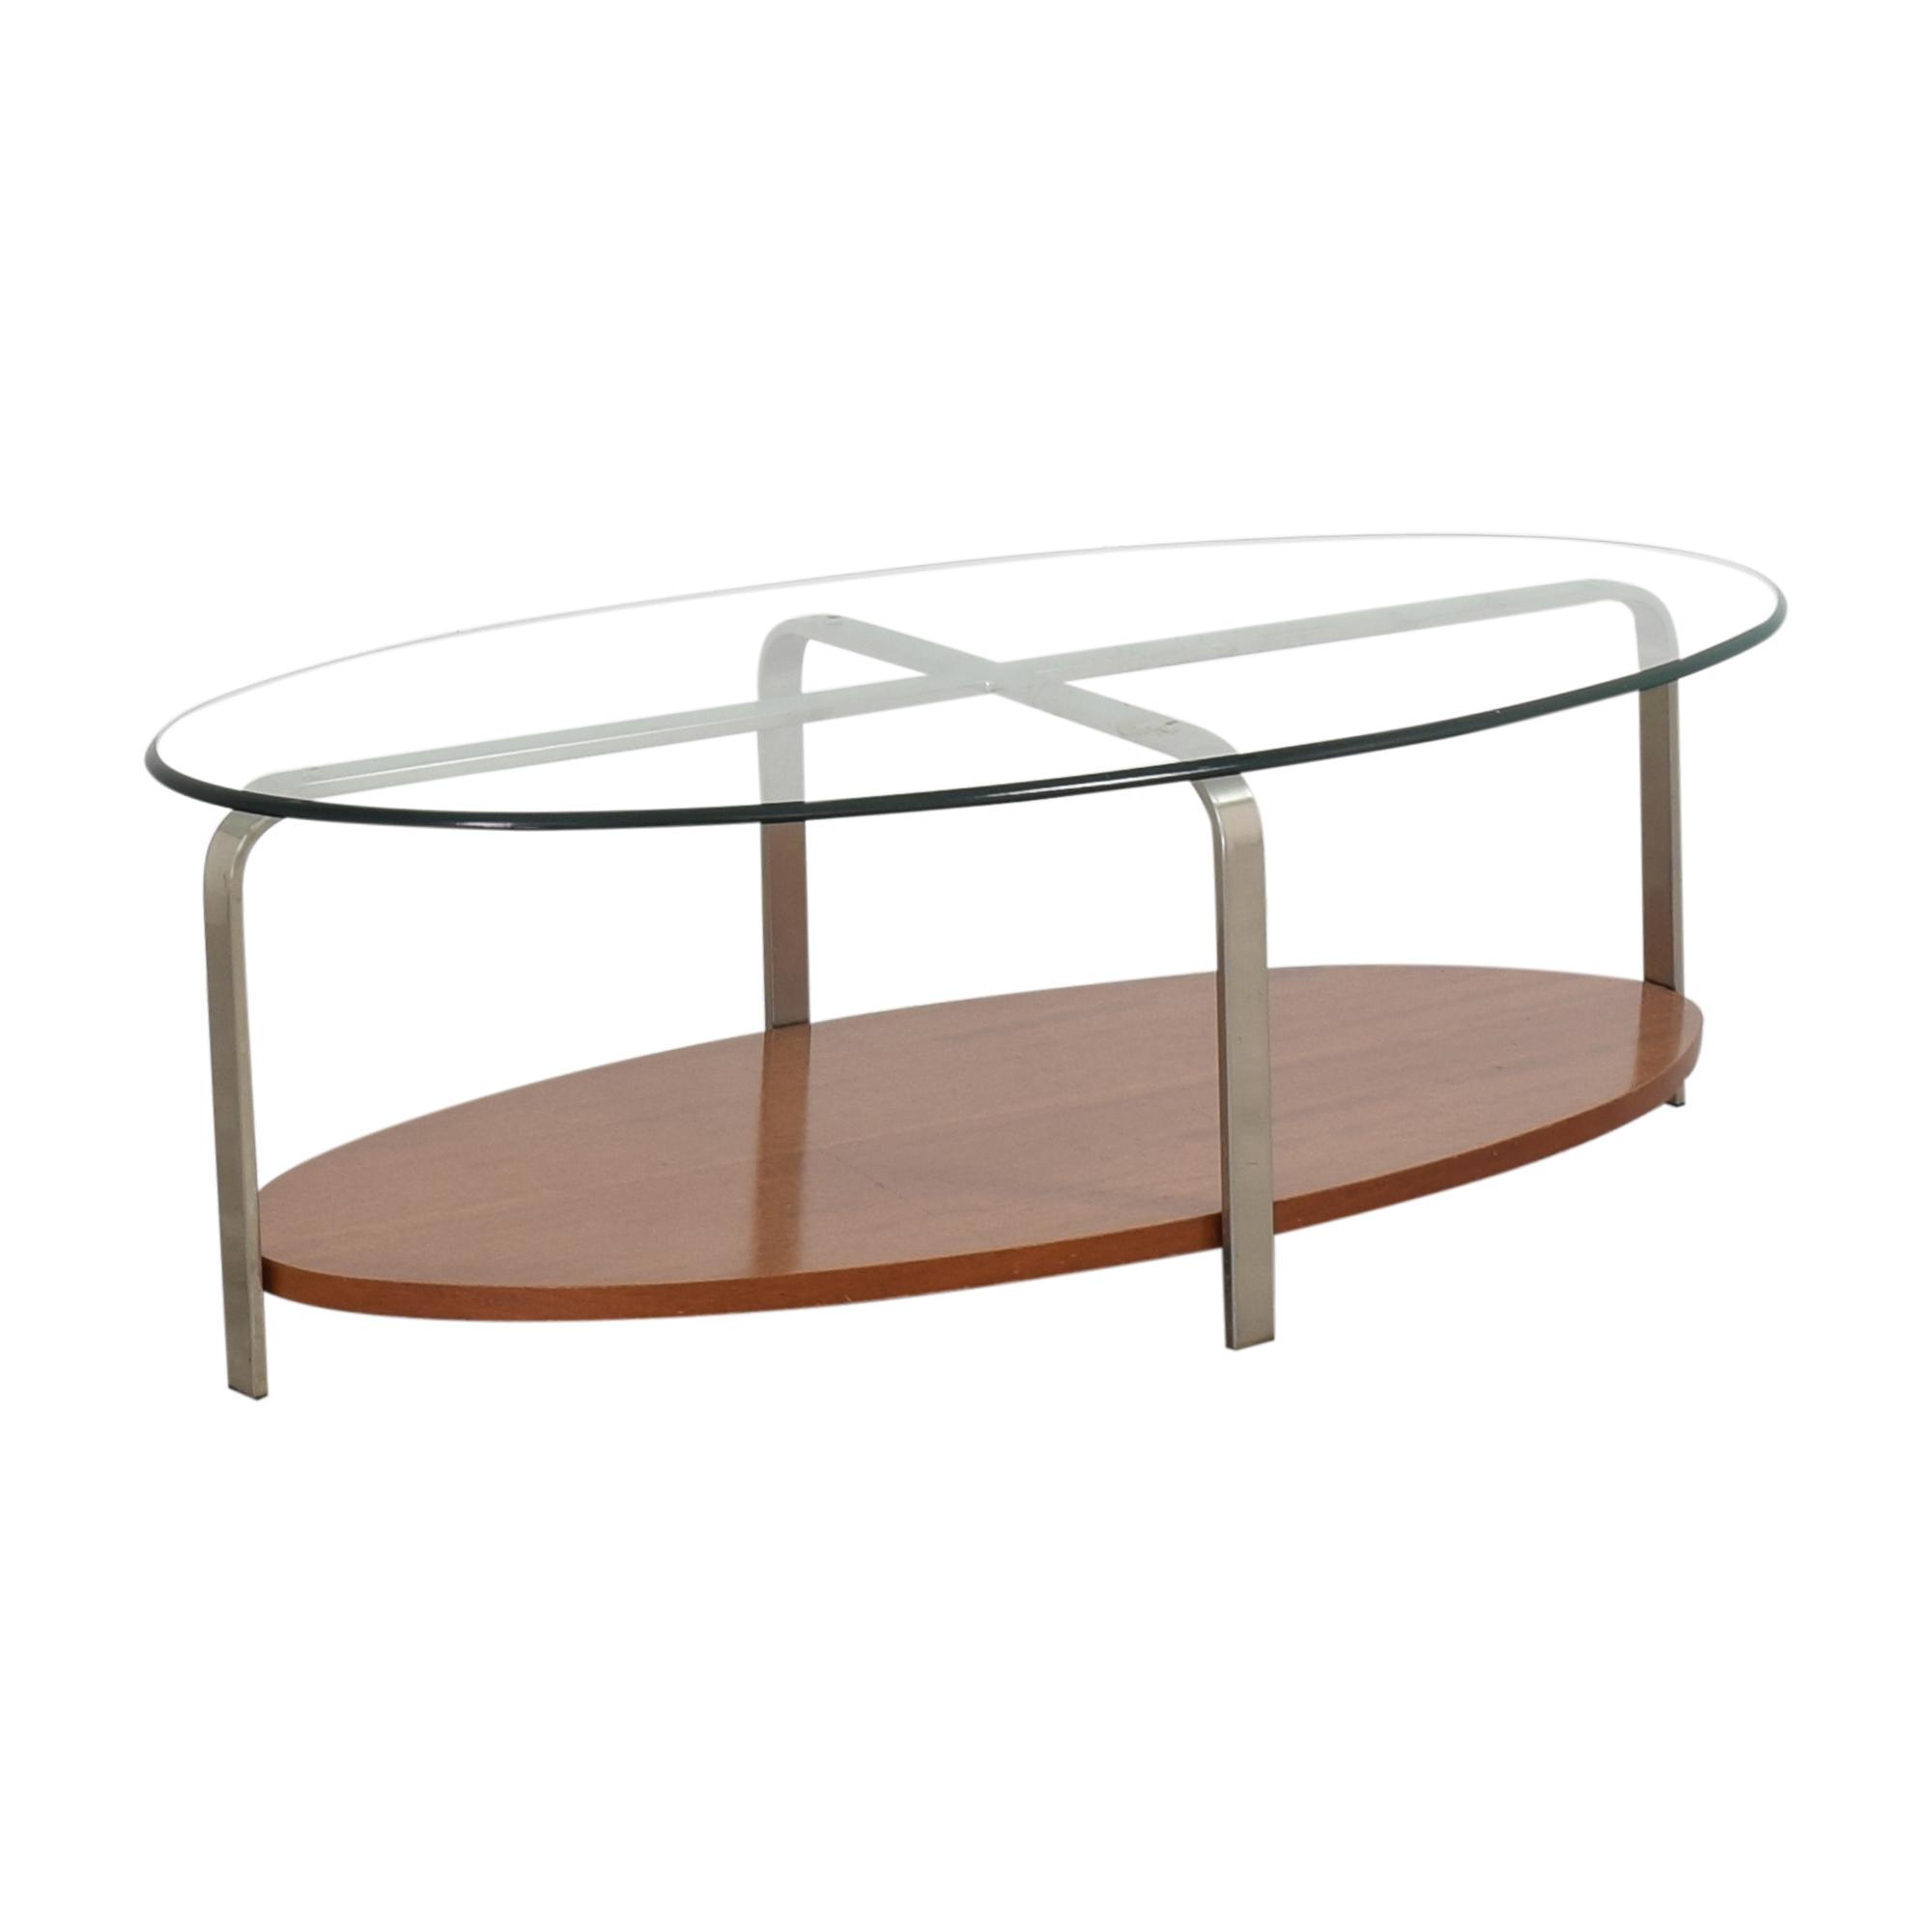 The Lane Company The Lane Company Oval Coffee Table ct